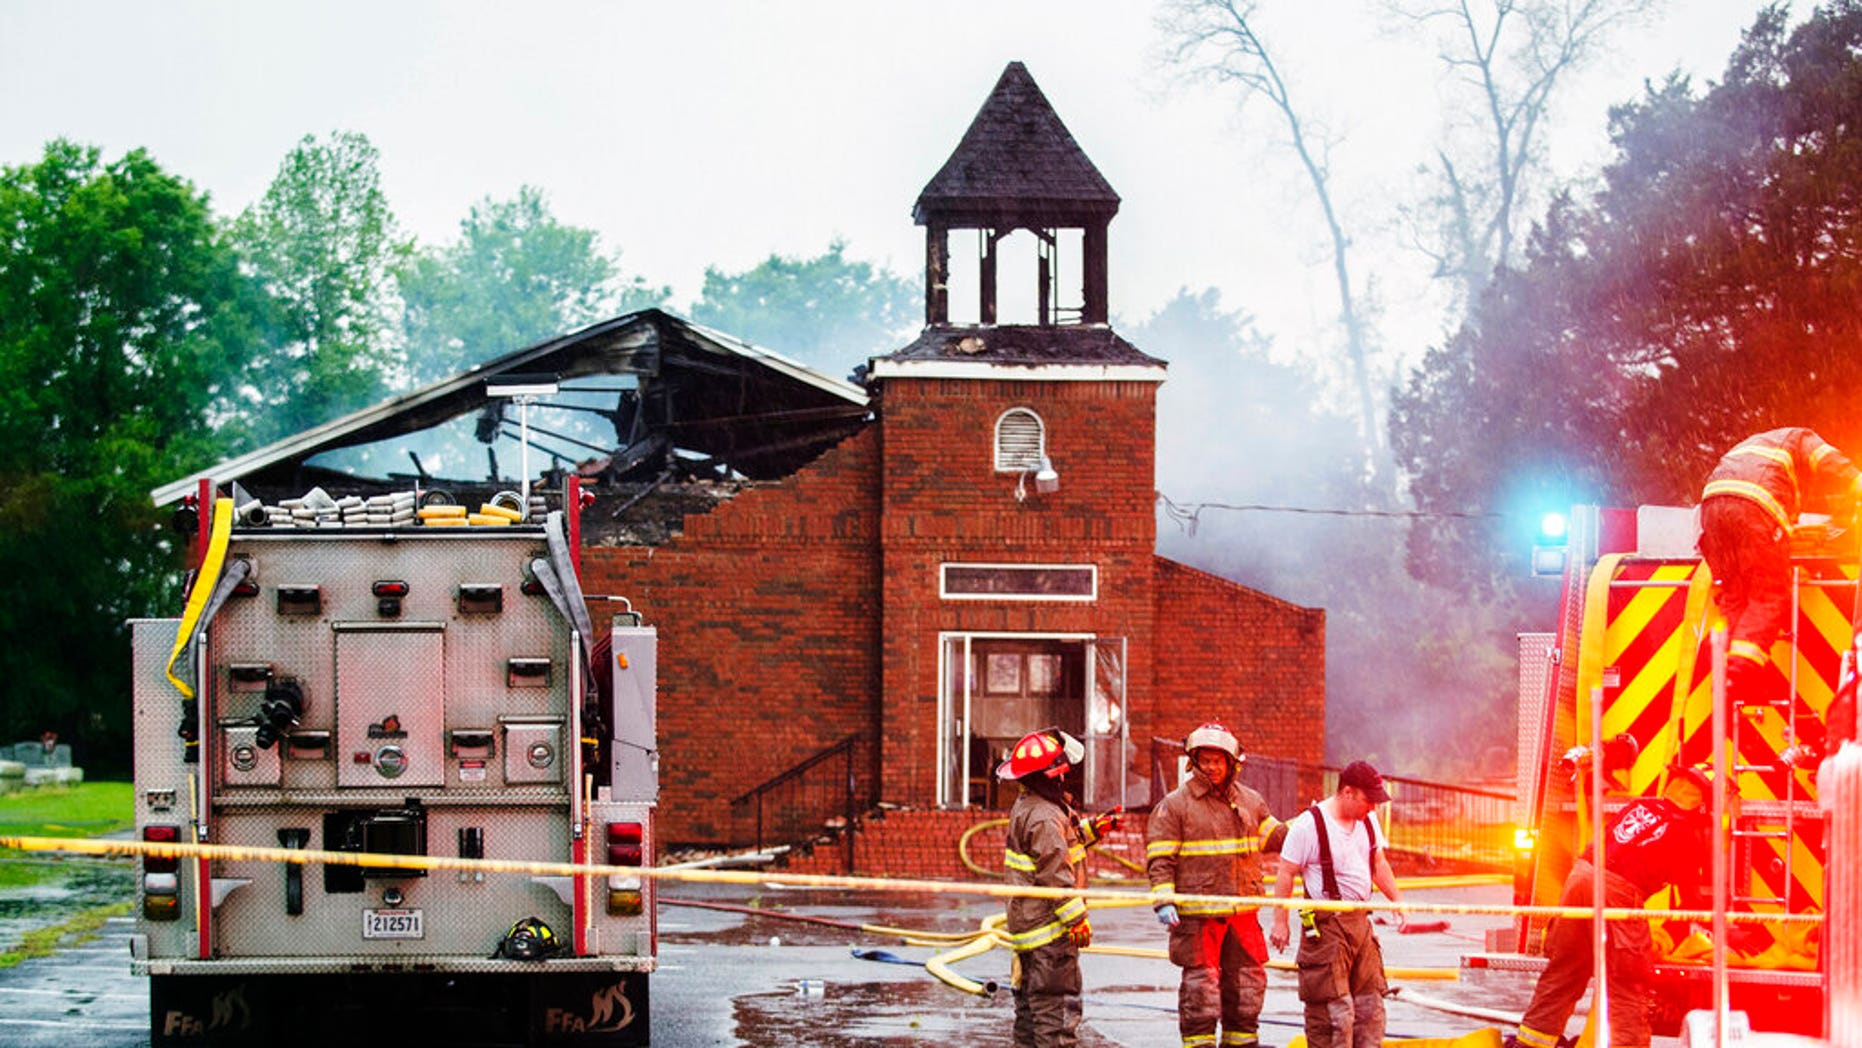 "FILE: Firefighters and fire investigators reacting to a fire in Mt. Pleasant Baptist Church Thursday, April 4, 201<div class=""e3lan e3lan-in-post1""><script async src=""//pagead2.googlesyndication.com/pagead/js/adsbygoogle.js""></script> <!-- Text_Image --> <ins class=""adsbygoogle""      style=""display:block""      data-ad-client=""ca-pub-6192903739091894""      data-ad-slot=""3136787391""      data-ad-format=""auto""      data-full-width-responsive=""true""></ins> <script> (adsbygoogle = window.adsbygoogle    []).push({}); </script></div>9, in Opelousas, La."